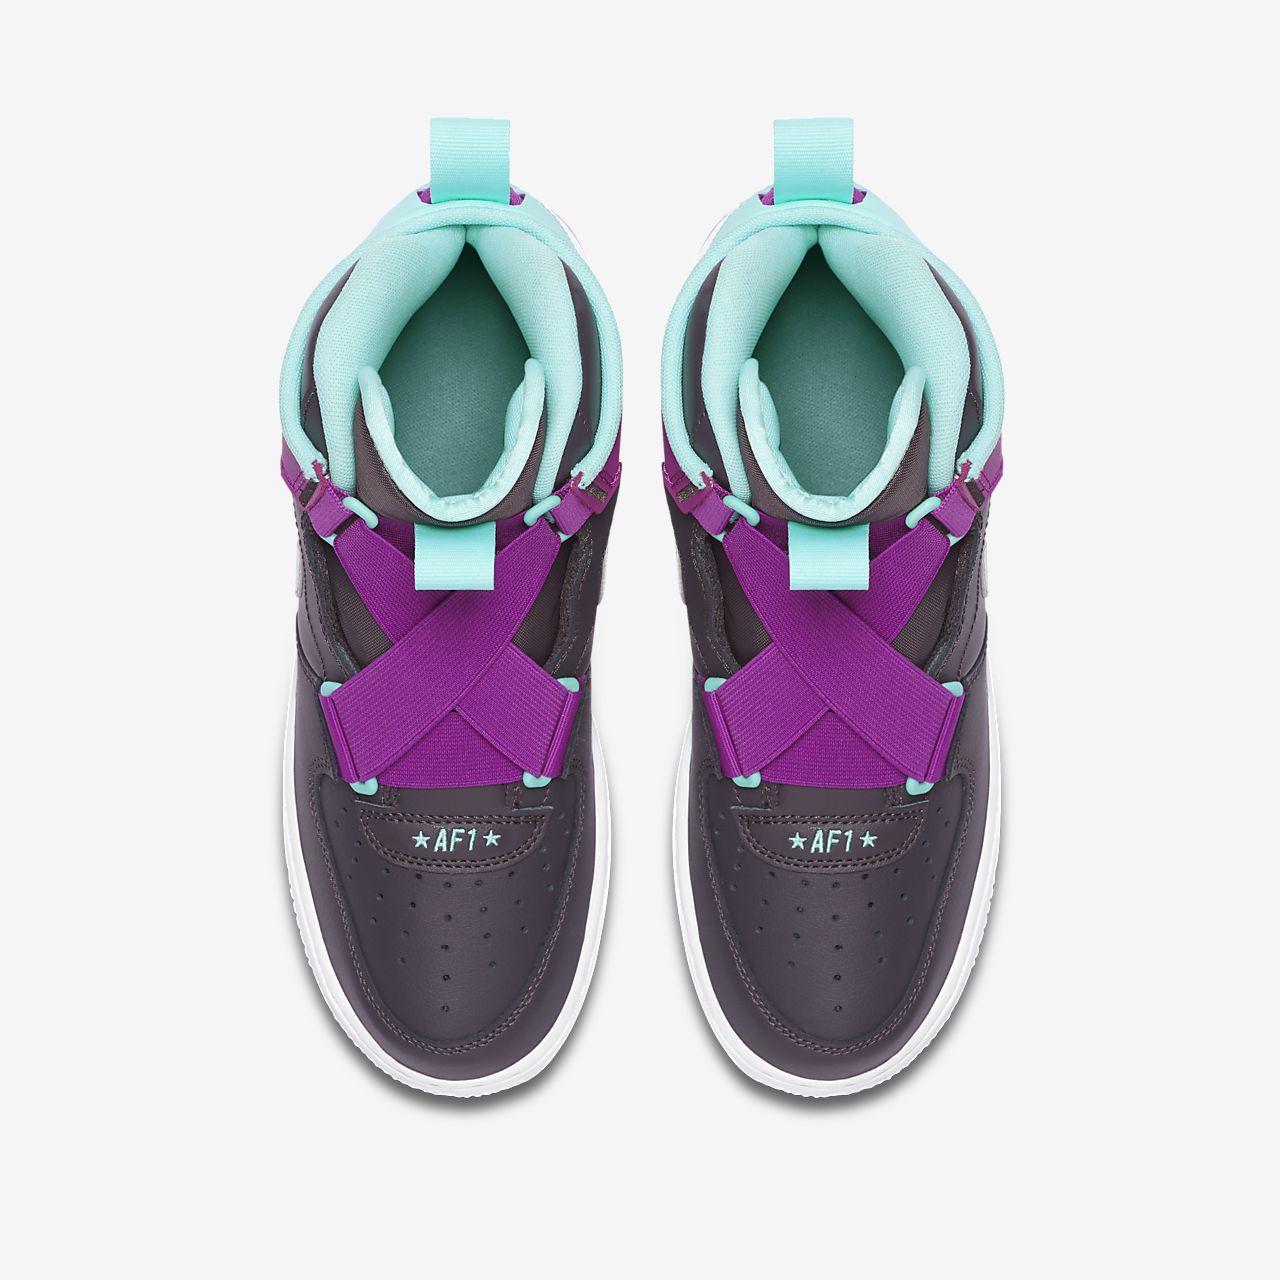 nike air force 1 femme violettes